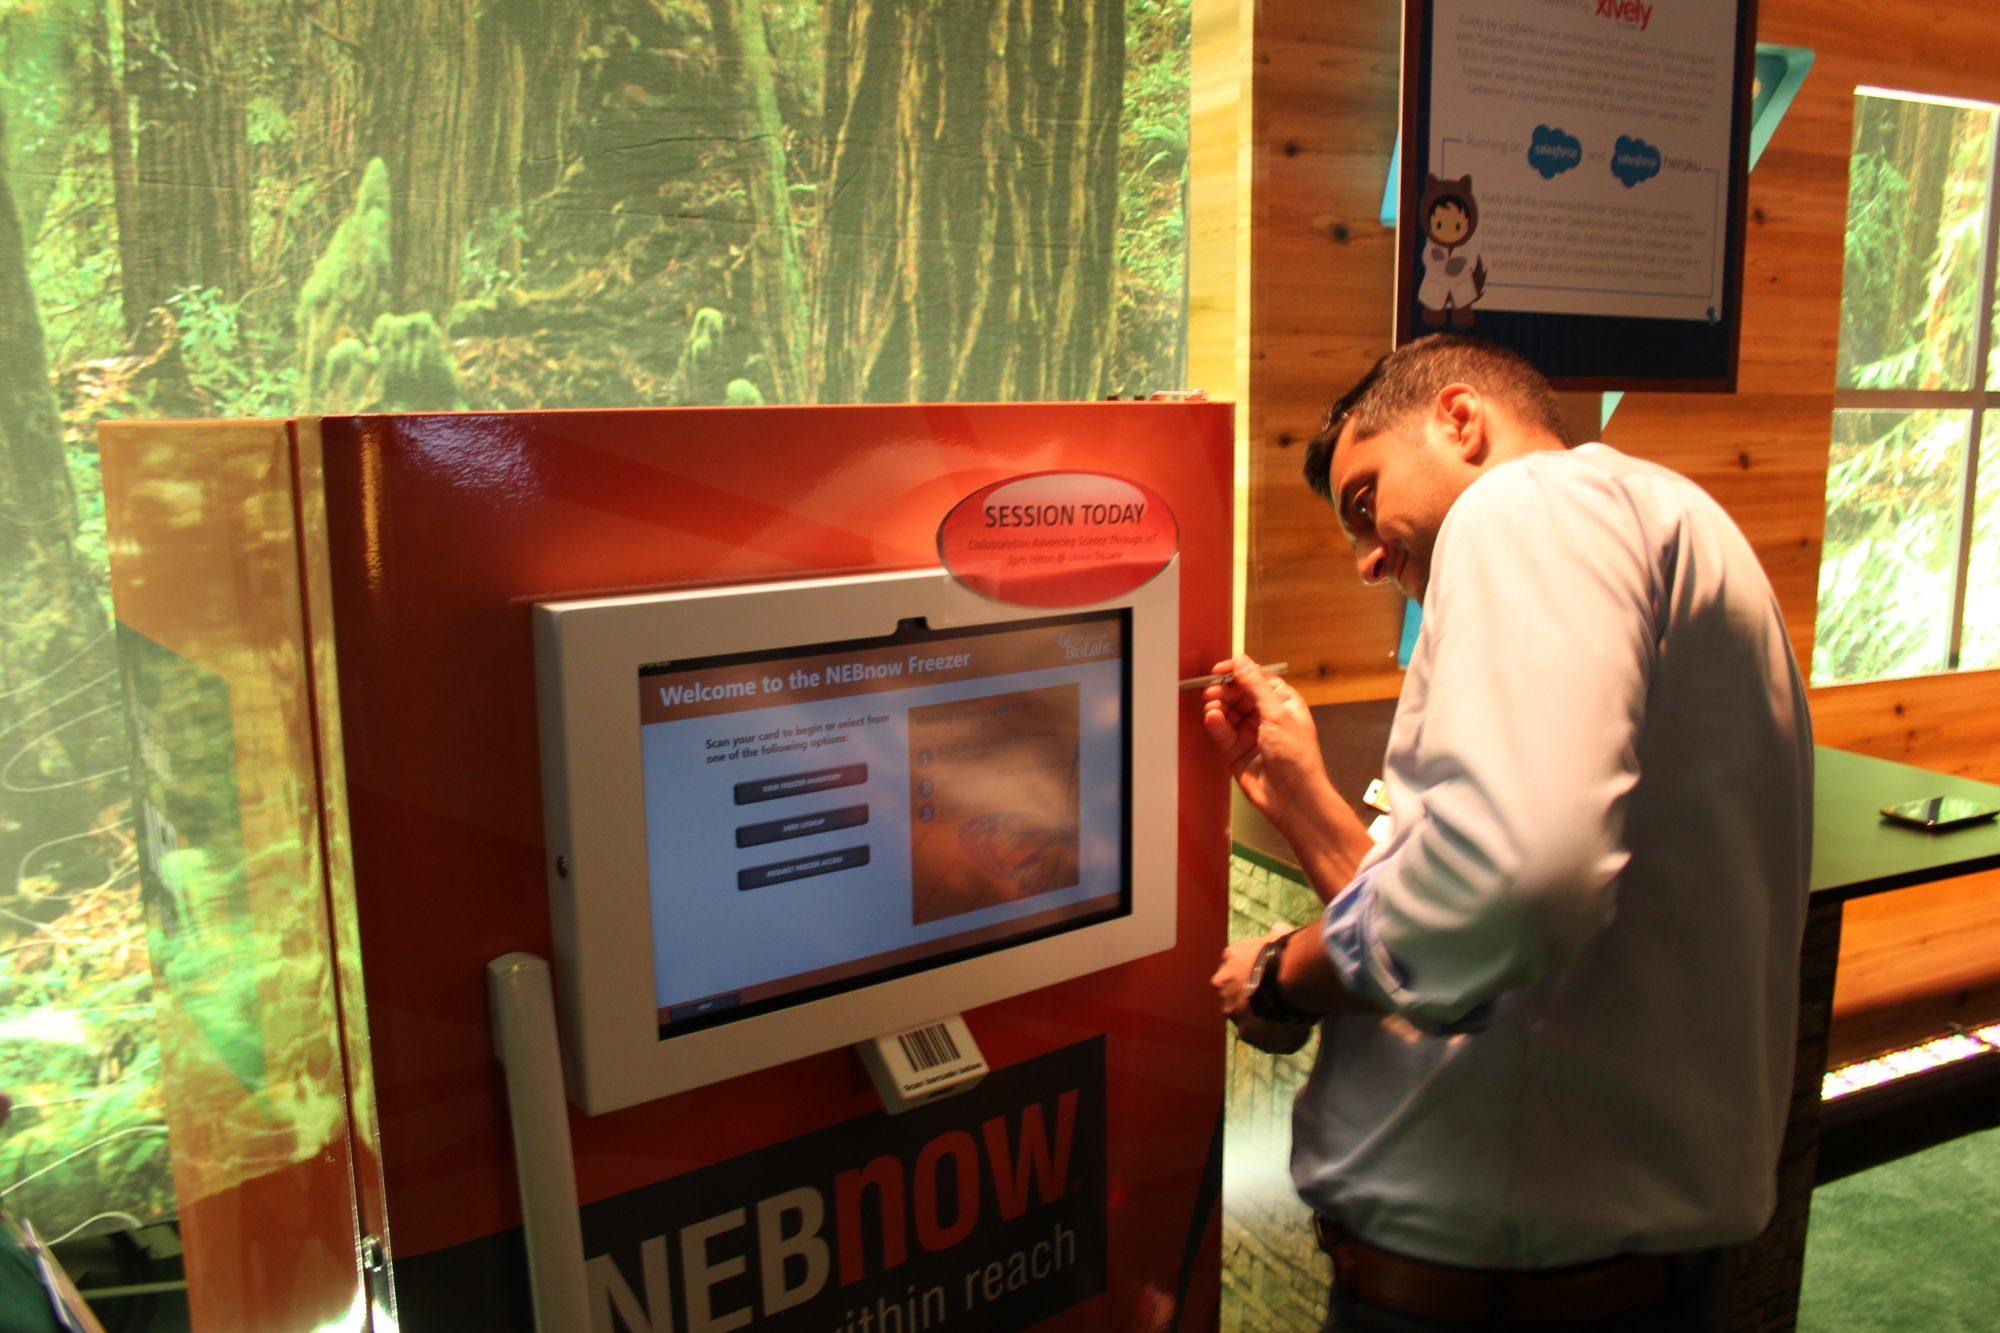 Salesforce IoT - Nebnow freezer